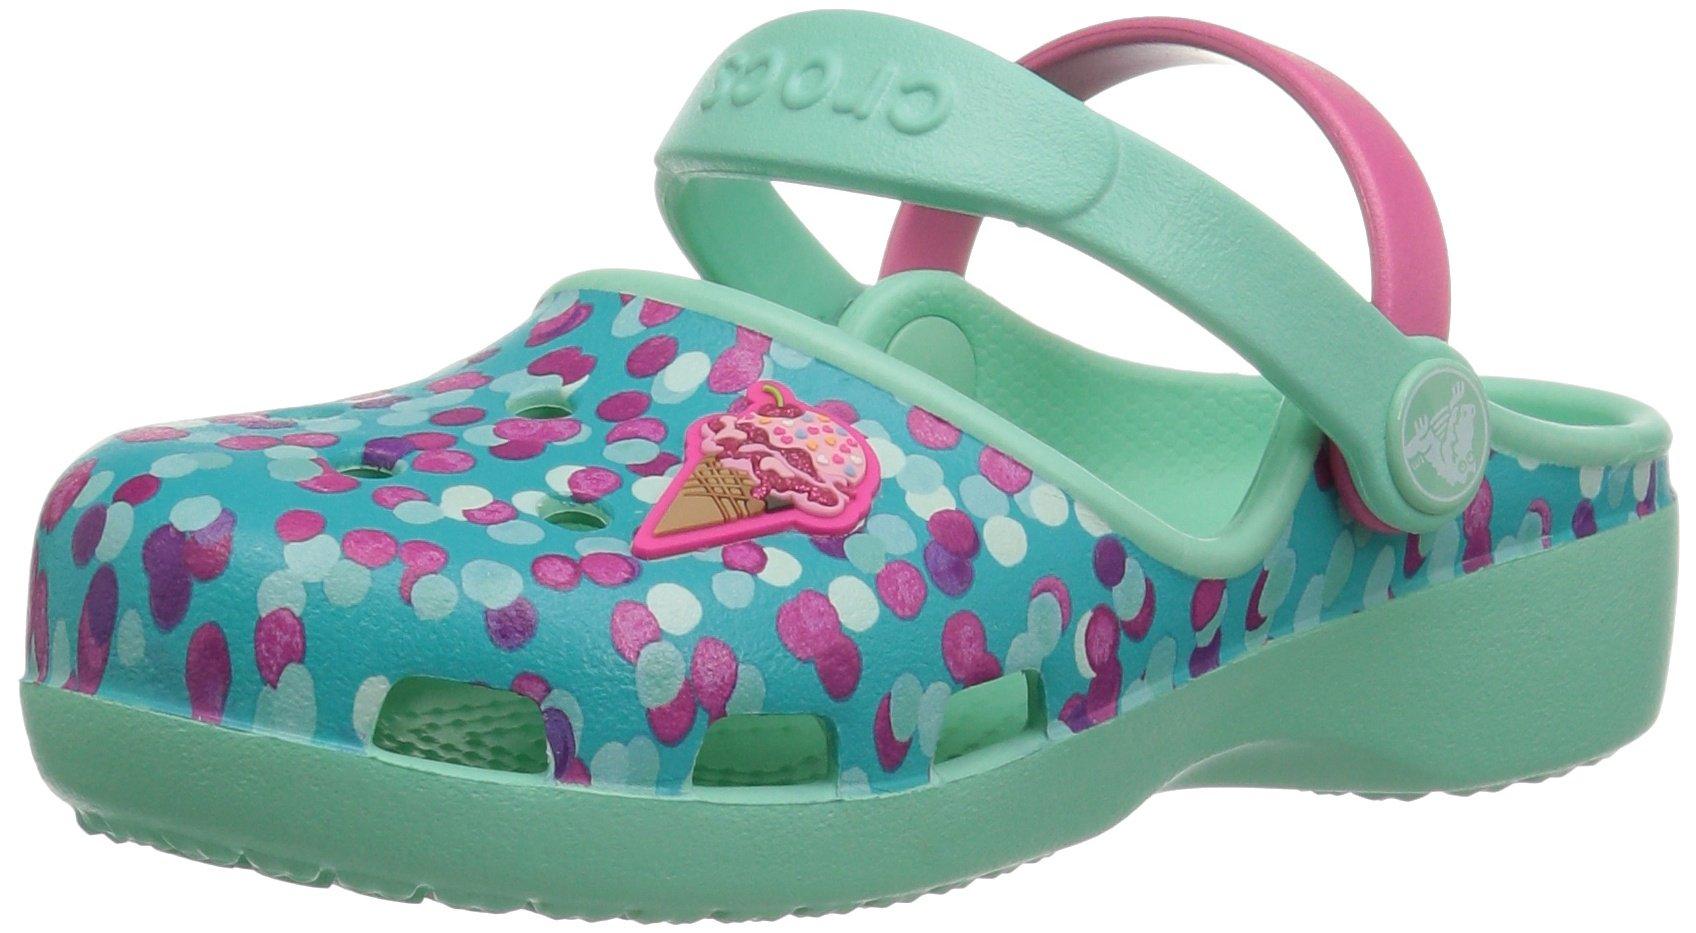 Crocs Girls' Karin Novelty K Clog, Mint, 2 M US Little Kid